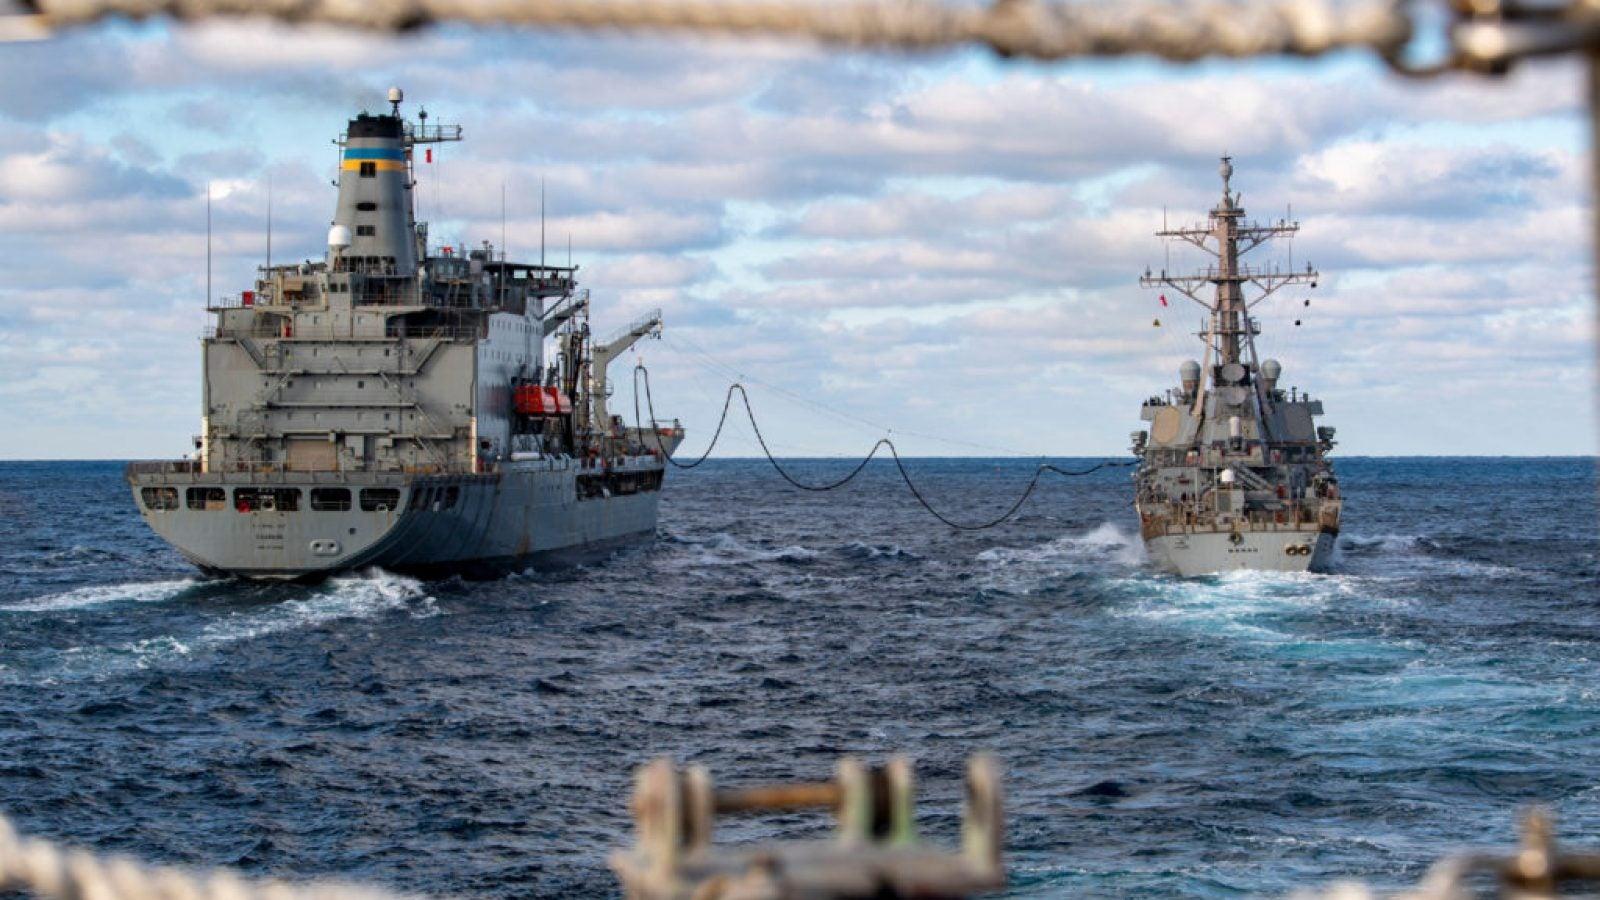 Two large naval ships at sea